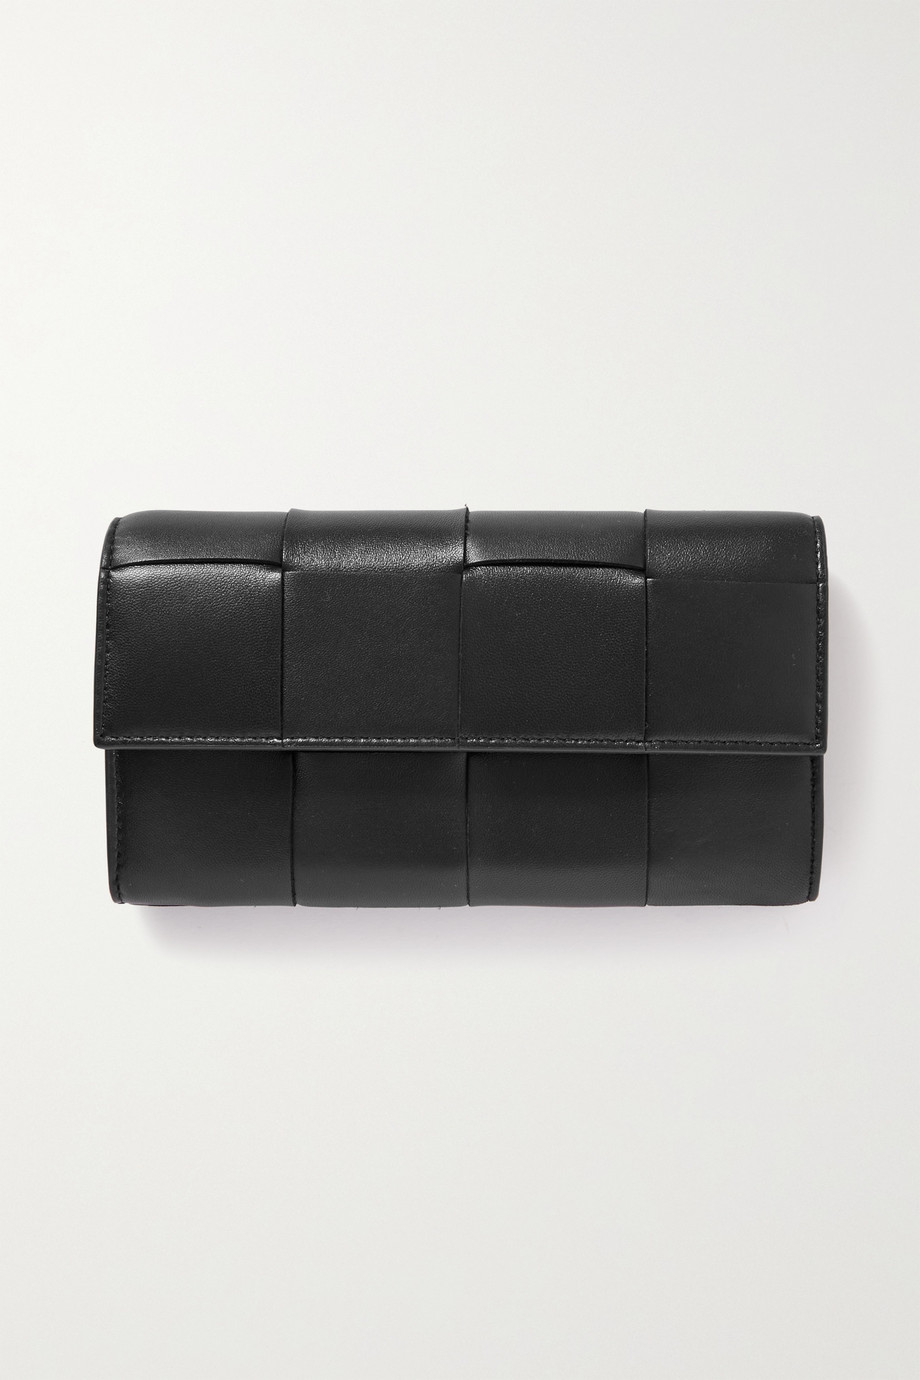 Bottega Veneta Cassette intrecciato leather wallet